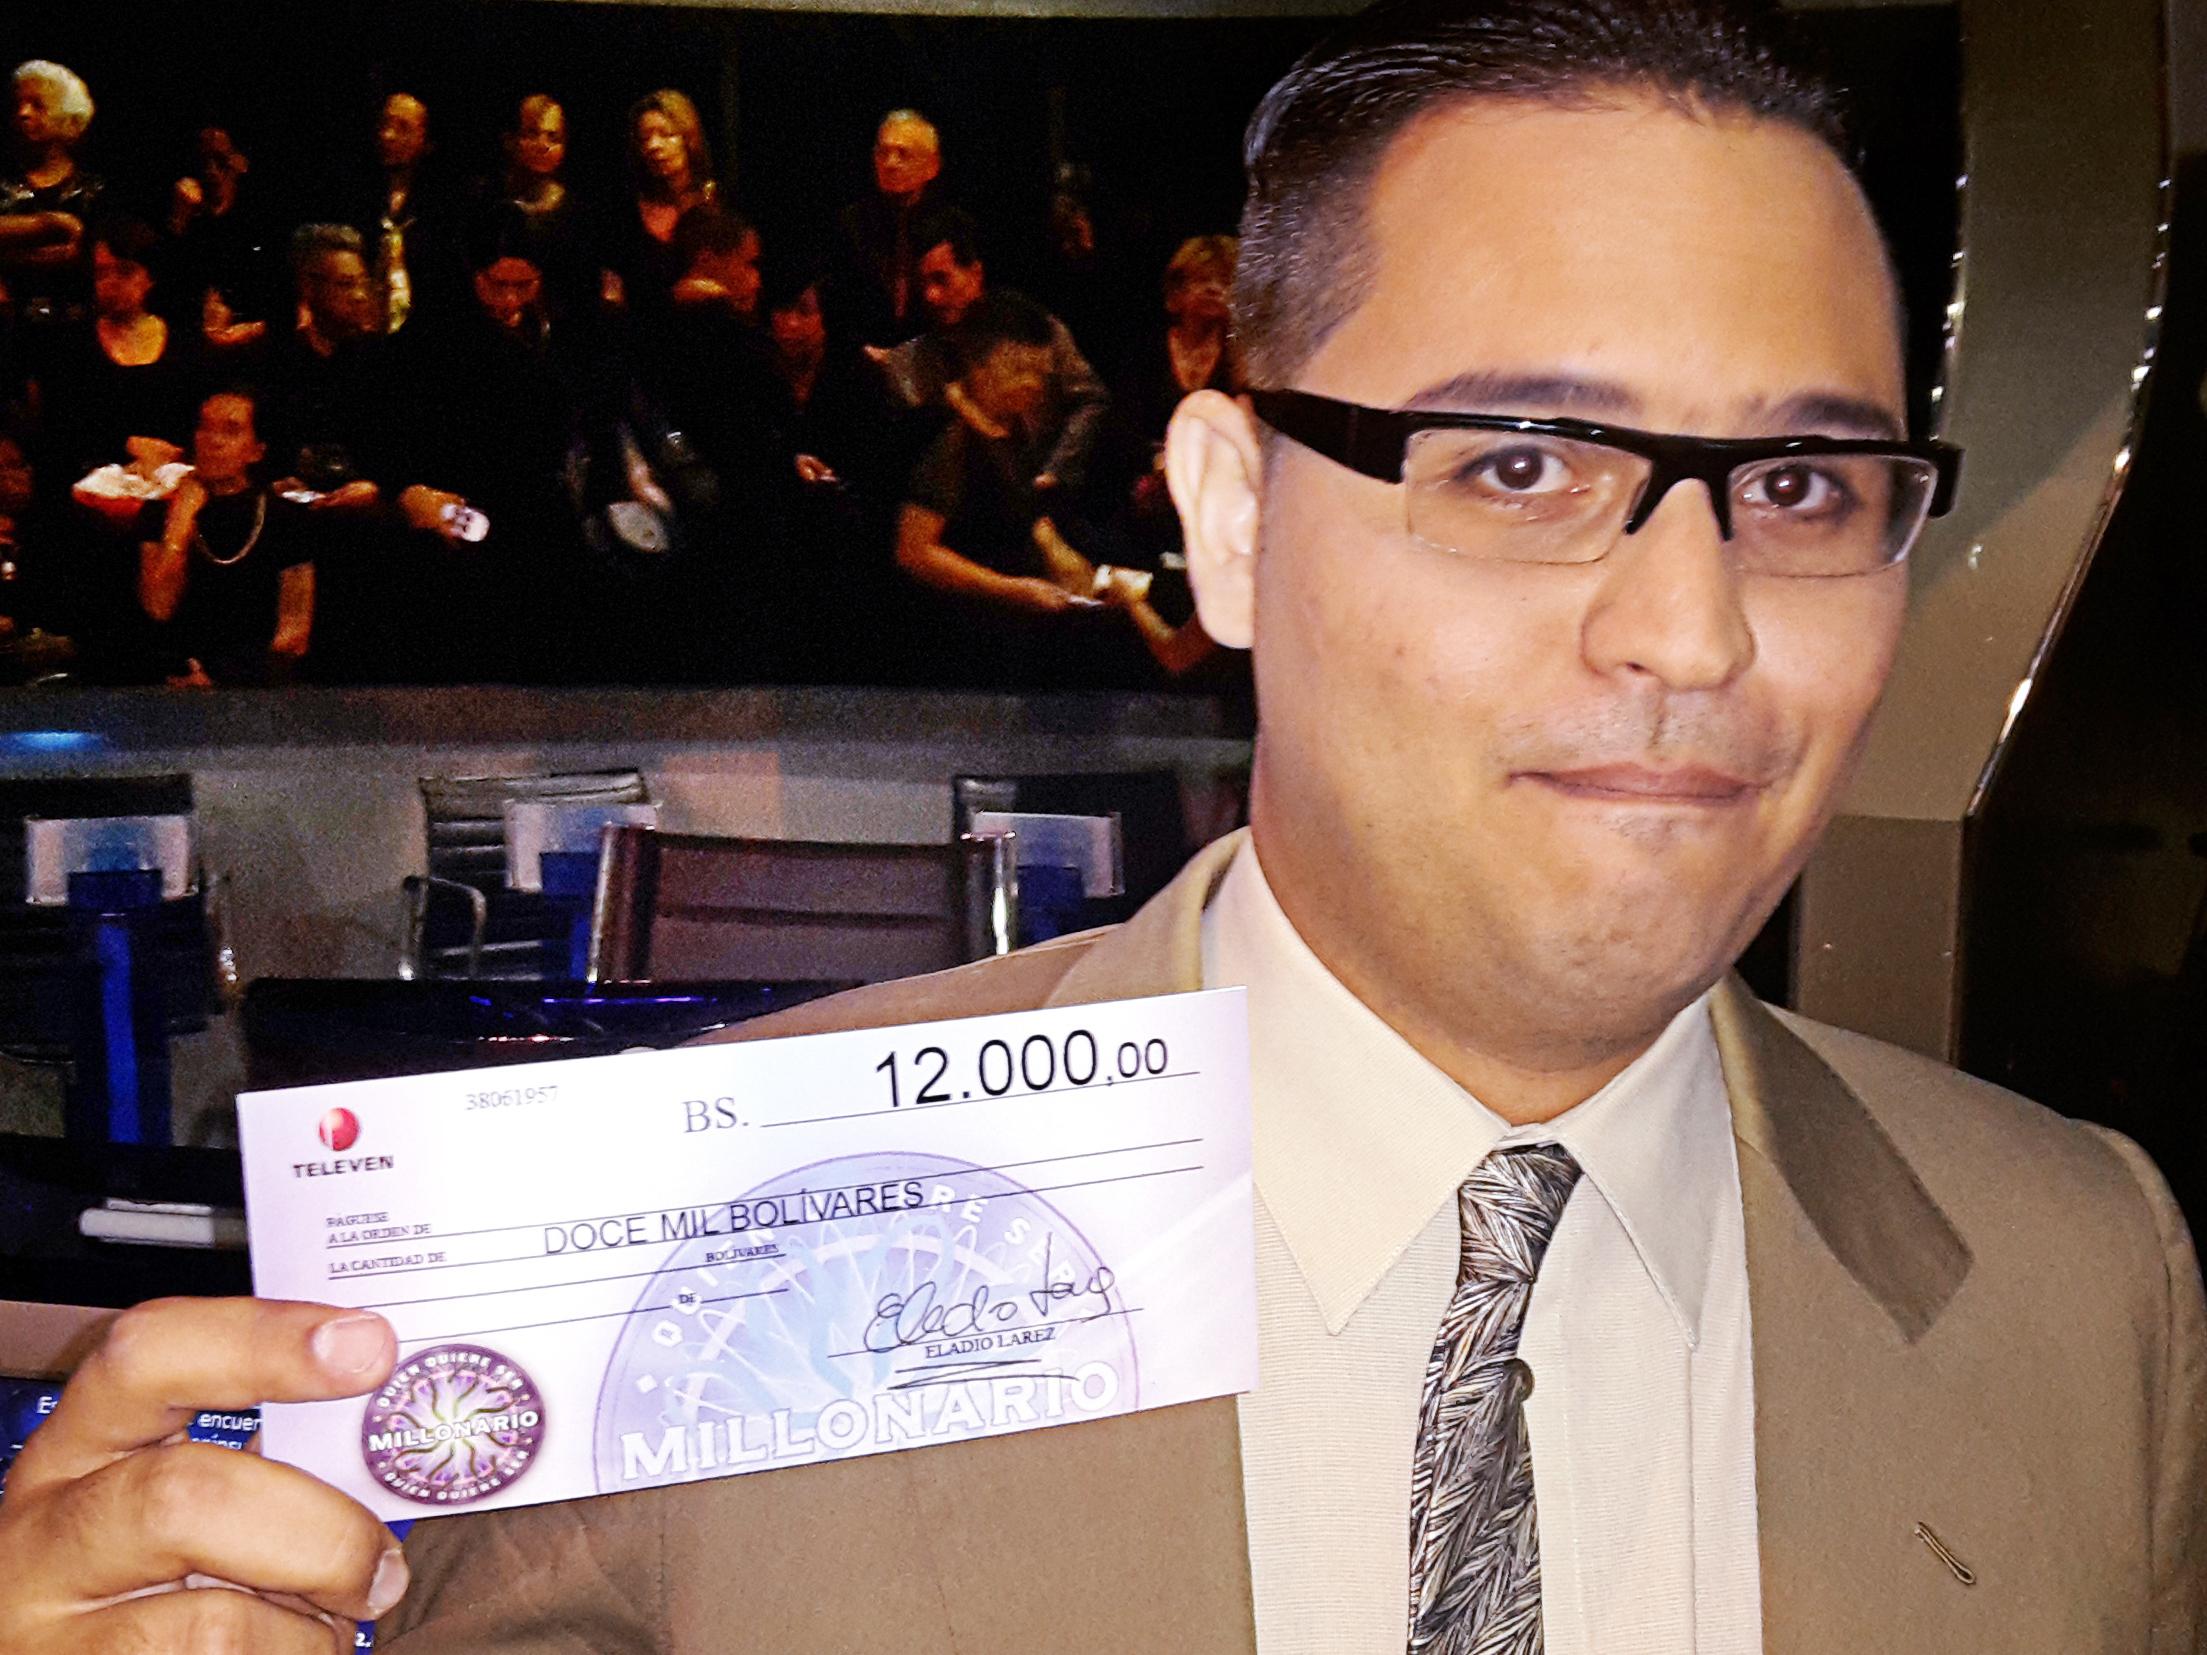 For Venezuela's 'Millionaire' Contestants, Winnings Amount To A Few Bucks